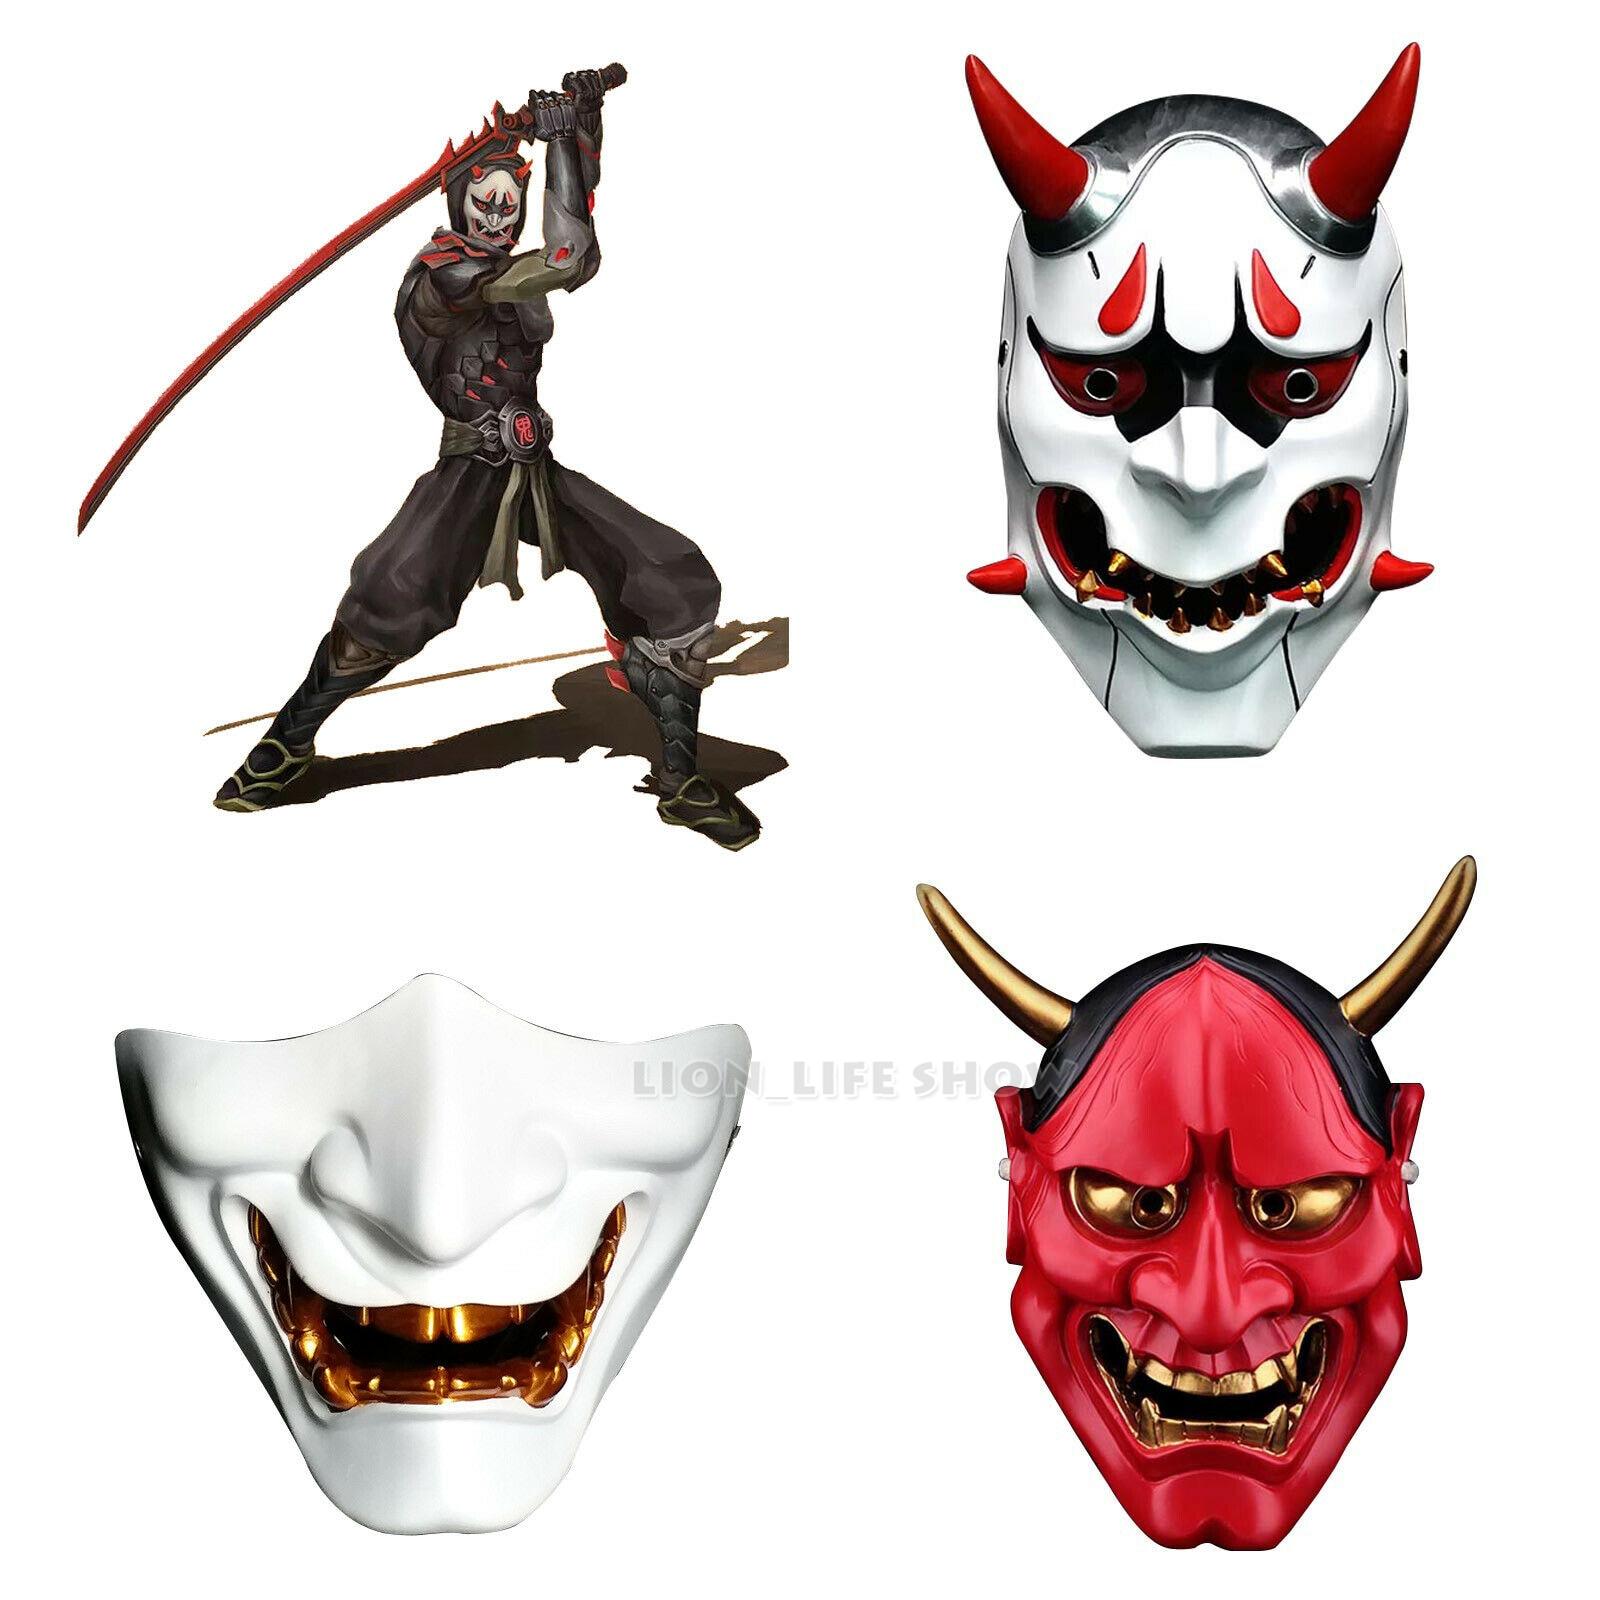 Budista japonés Evil Oni Noh Hannya utilería máscara de Halloween Cosplay máscaras de resina